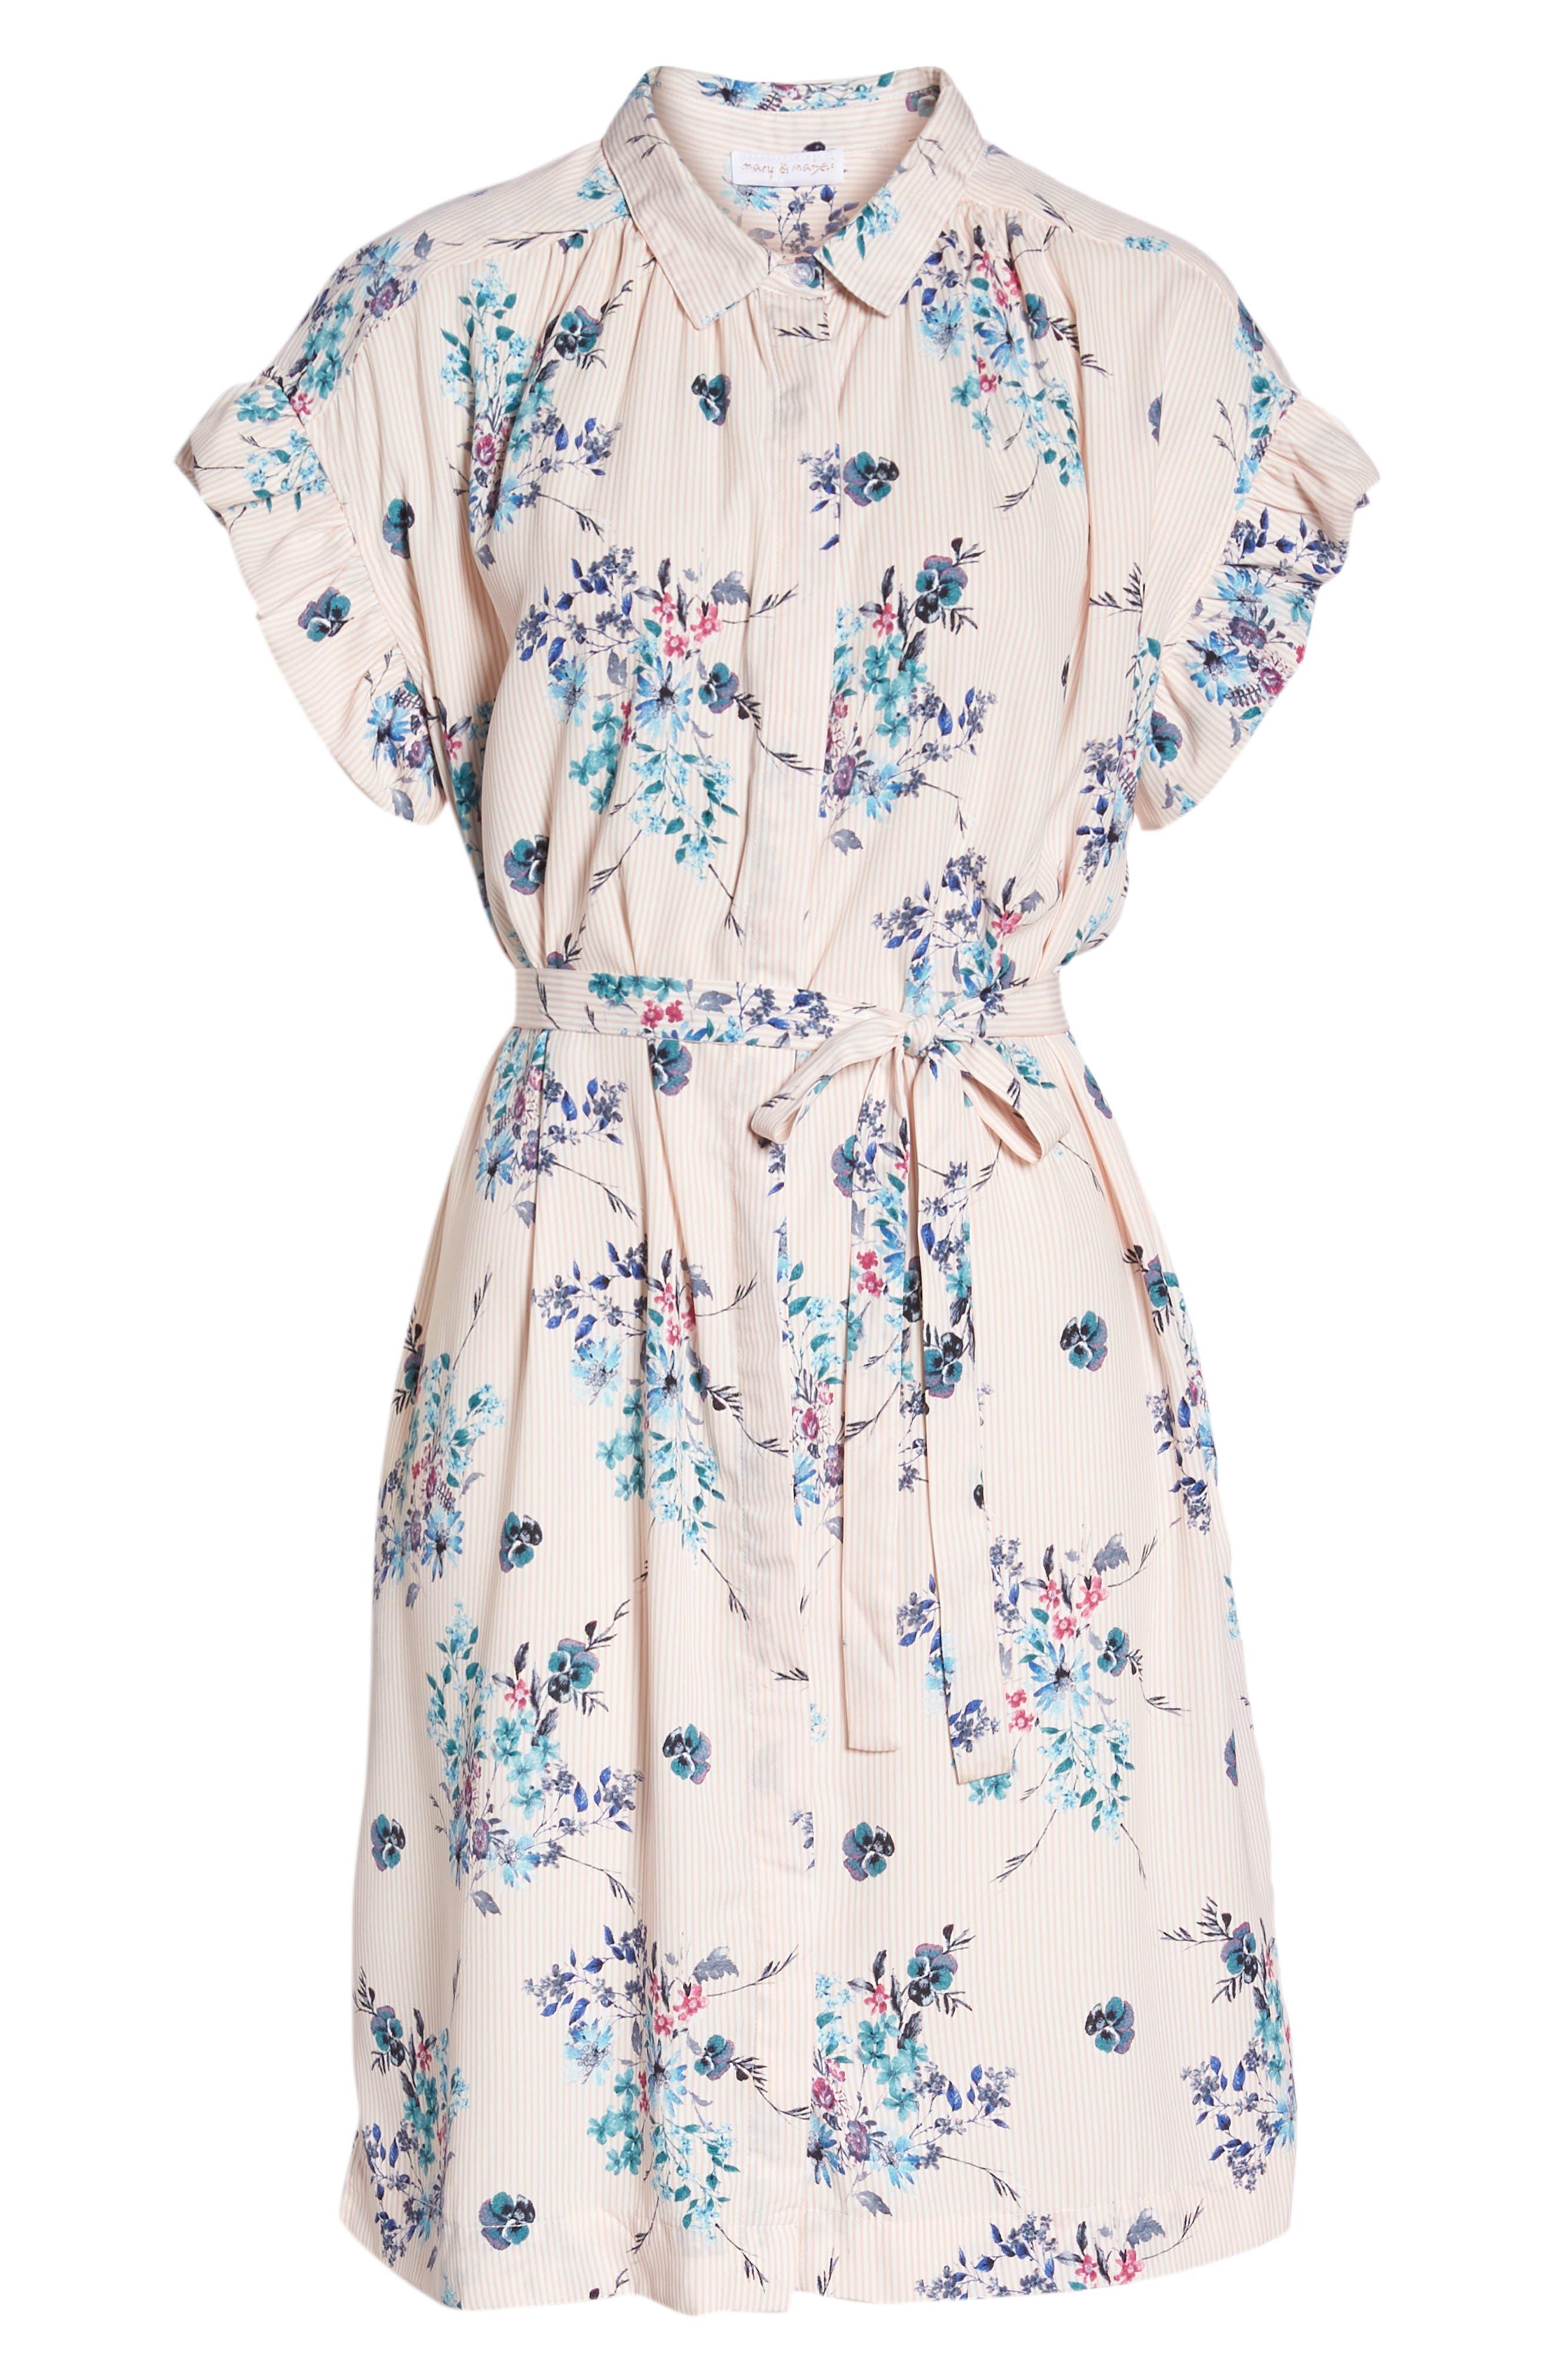 MARY & MABEL,                             Ruffle Sleeve Shirt Dress,                             Alternate thumbnail 7, color,                             652